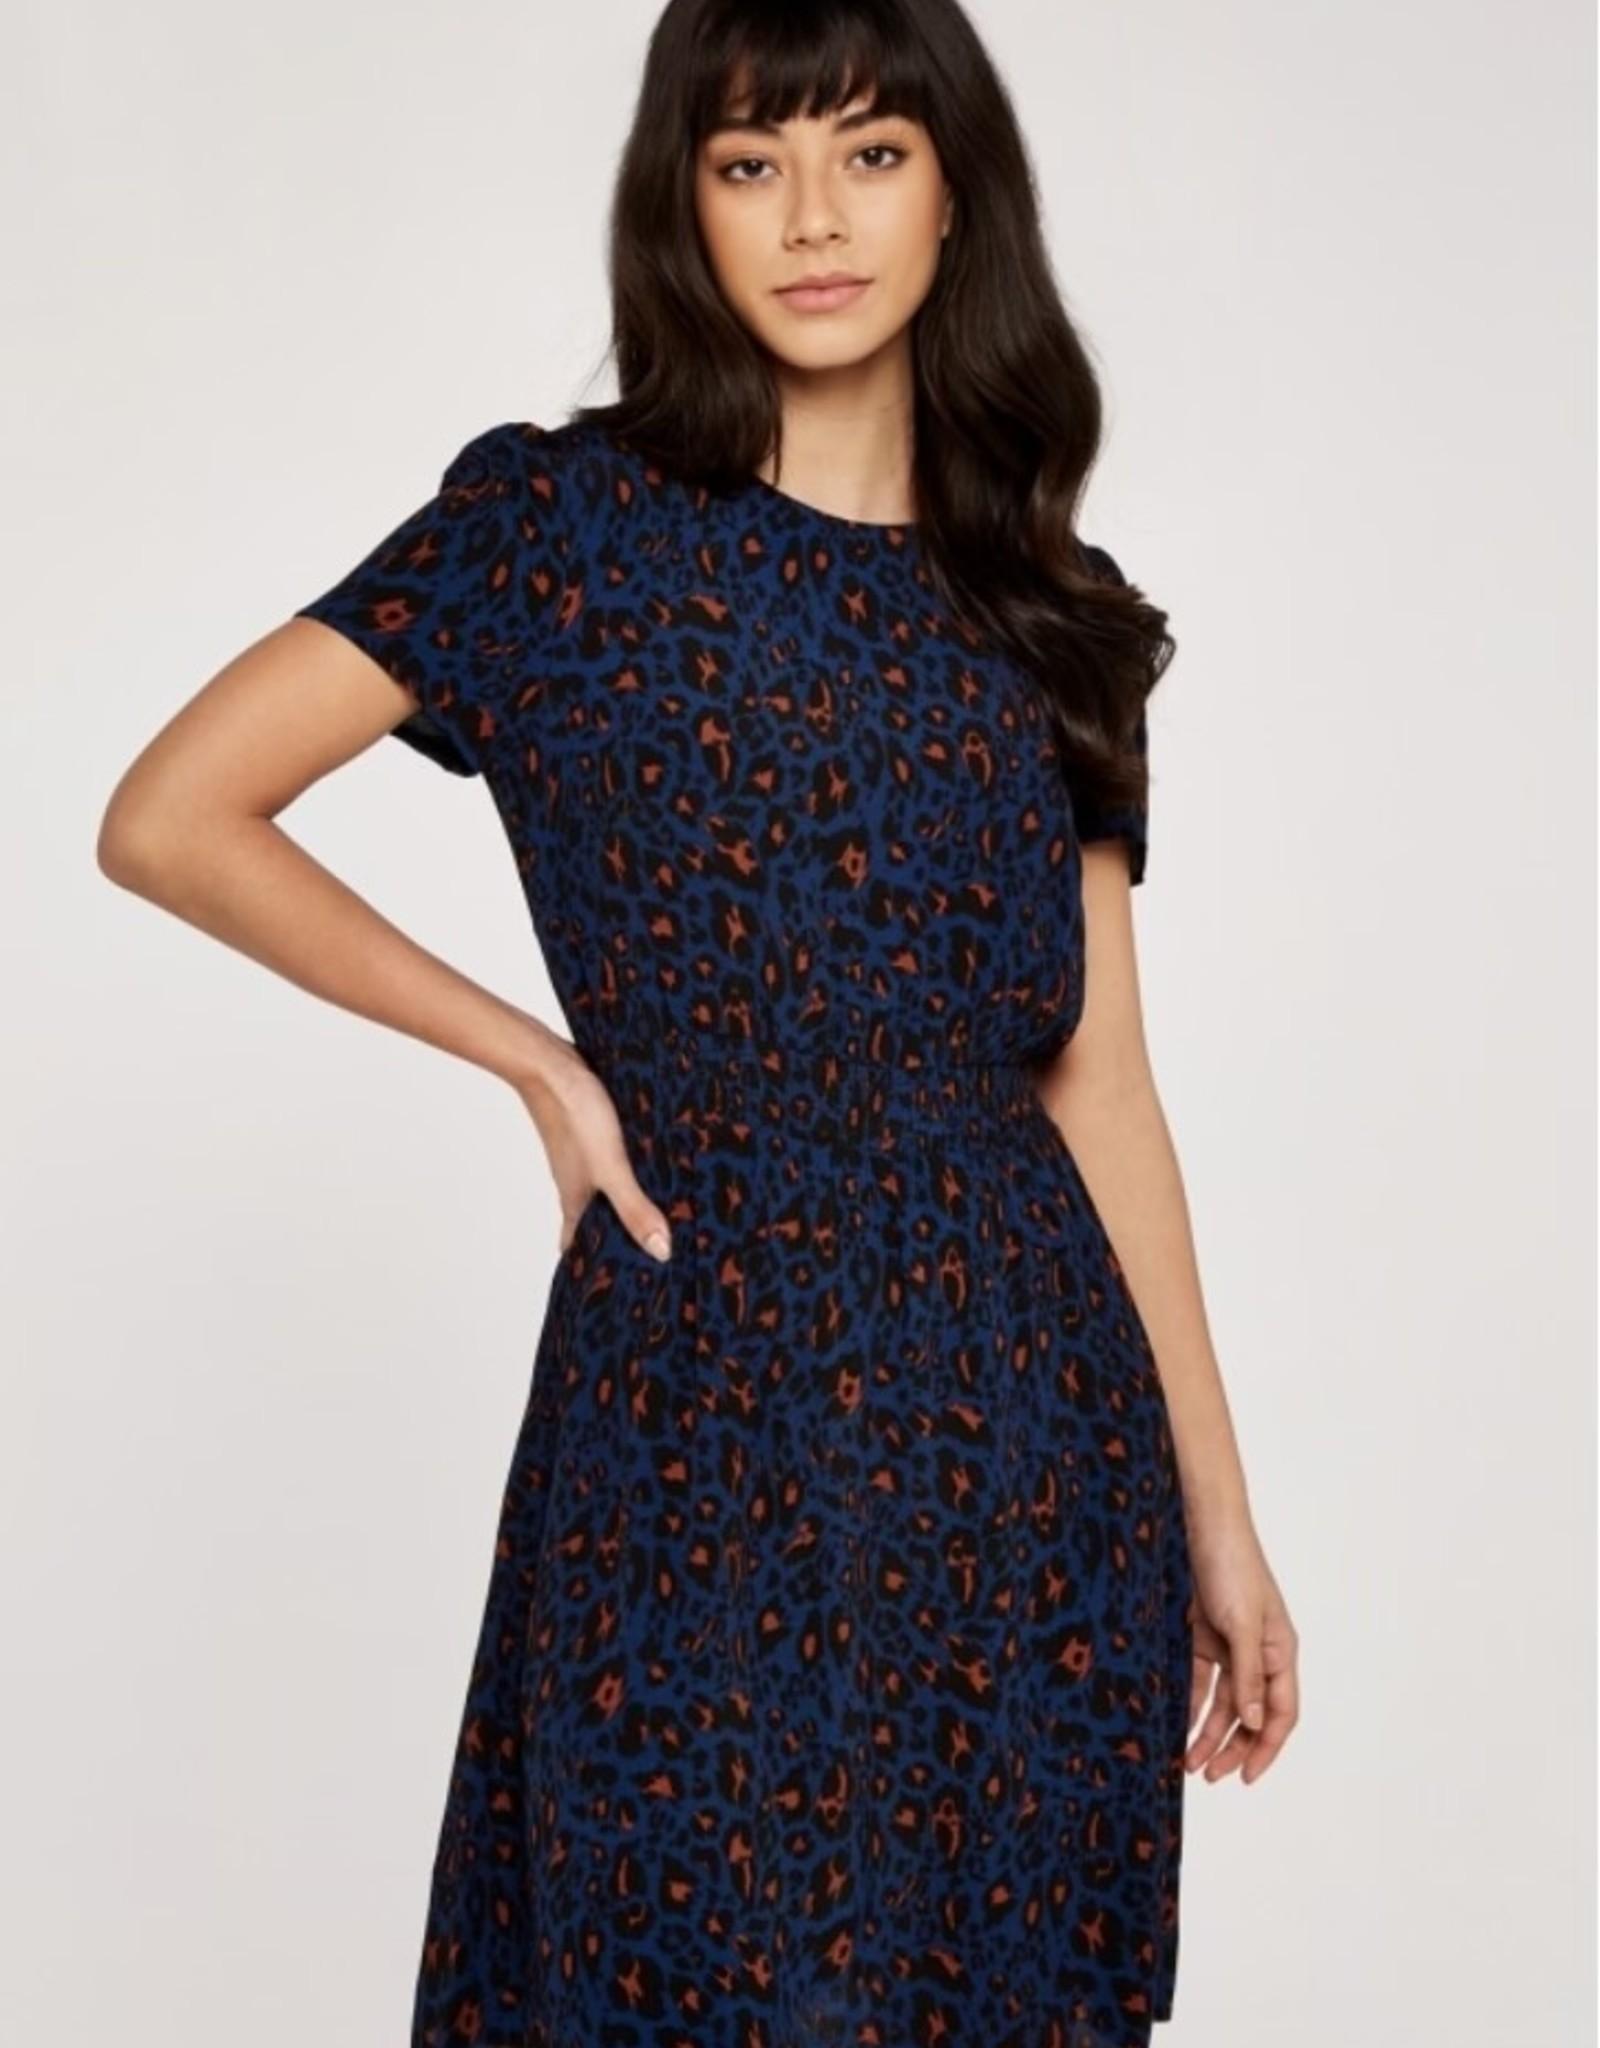 Apricot Shirred Waist Navy Dress